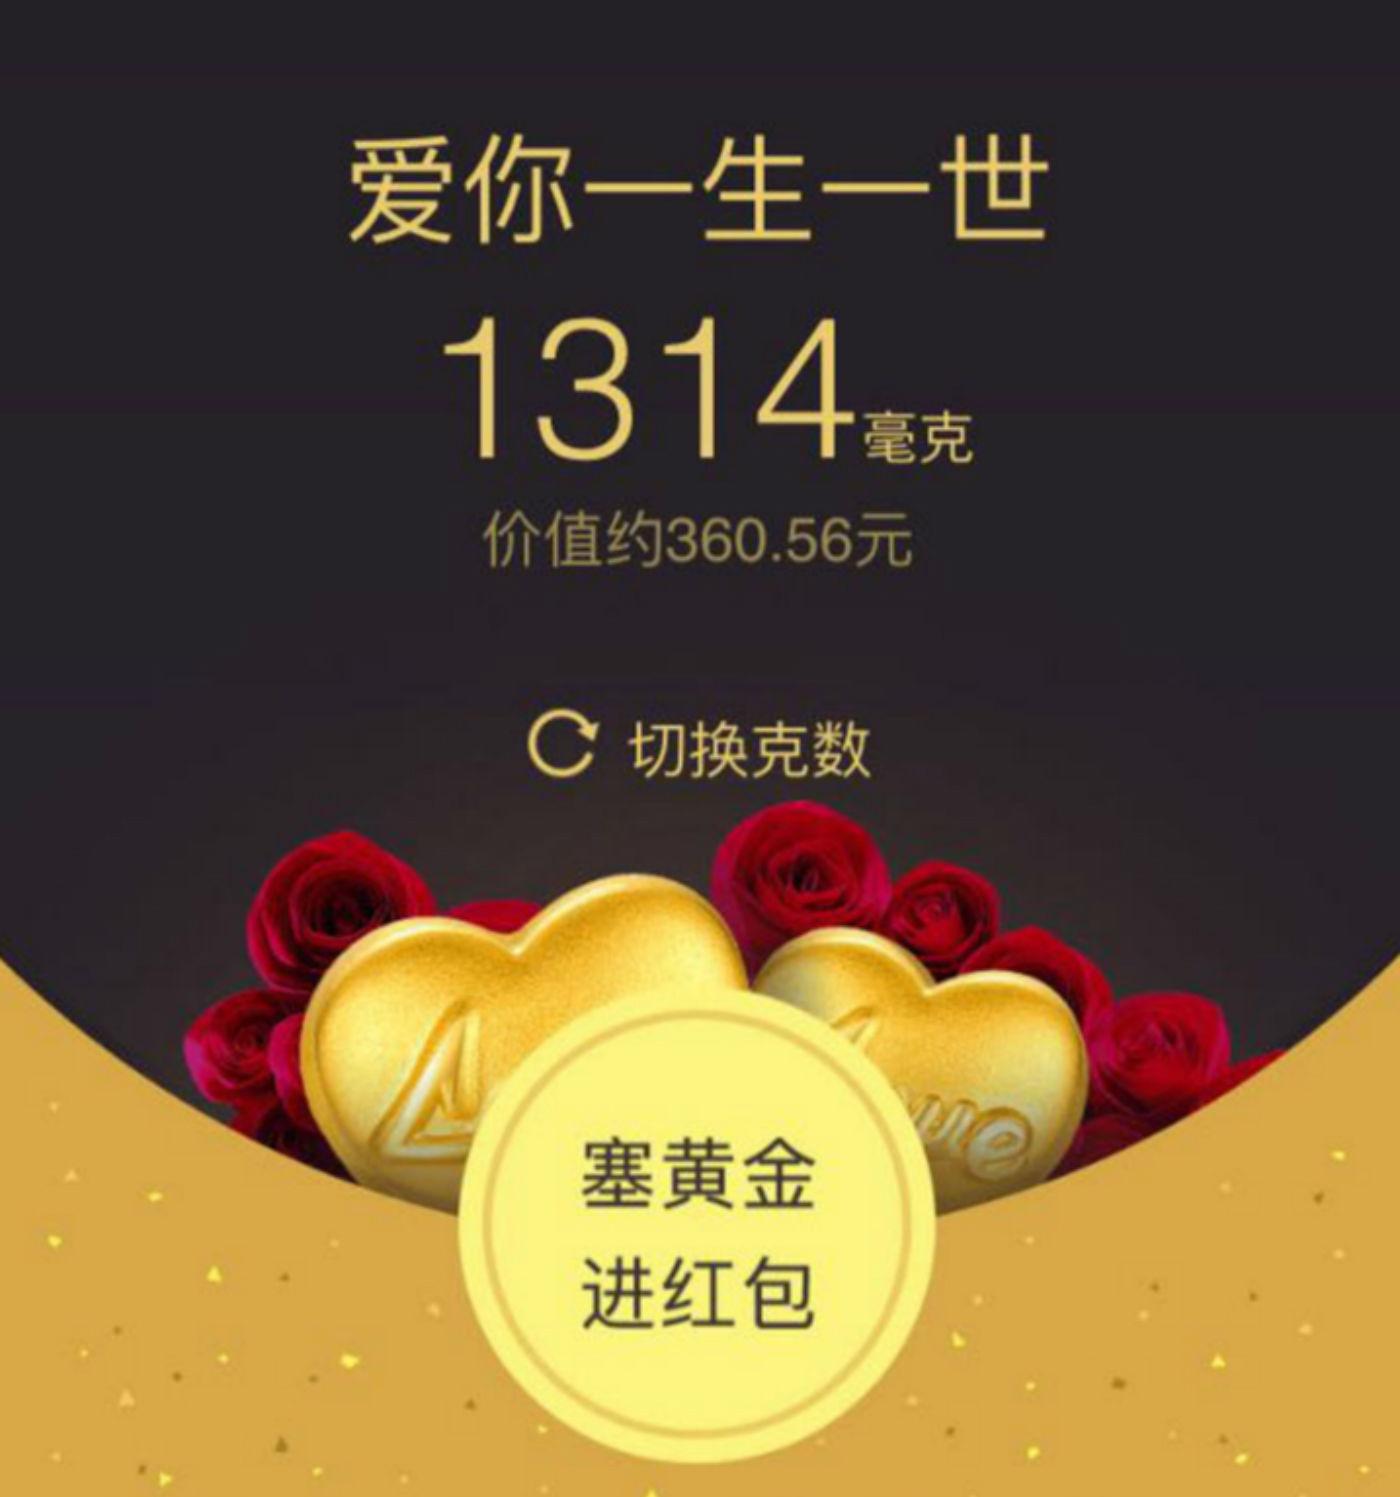 wechat-gold-bag_meitu_2.jpg